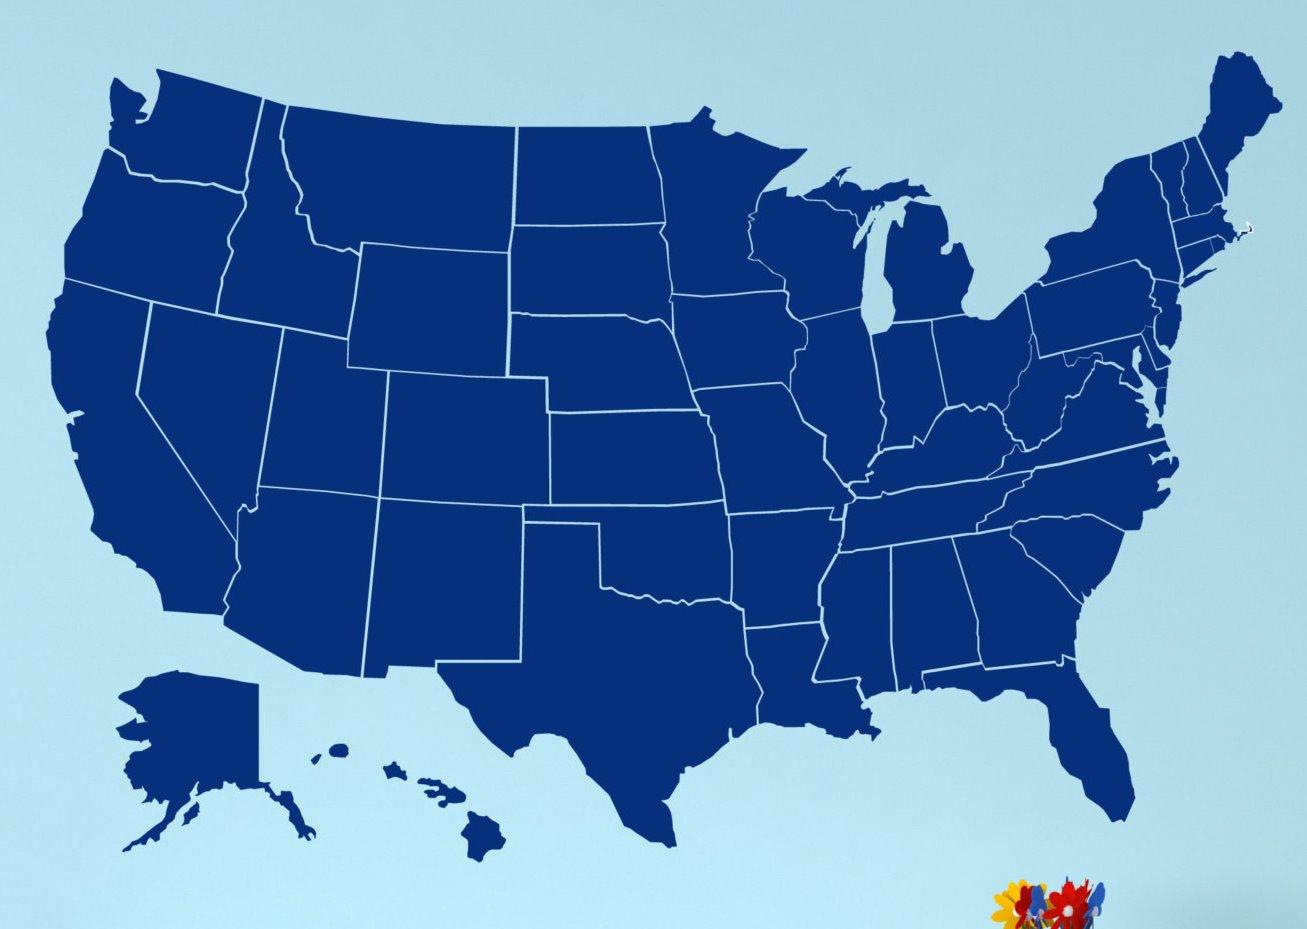 Bureau Of Emergency Medical Services And Preparedness Utah - Utah-location-on-us-map